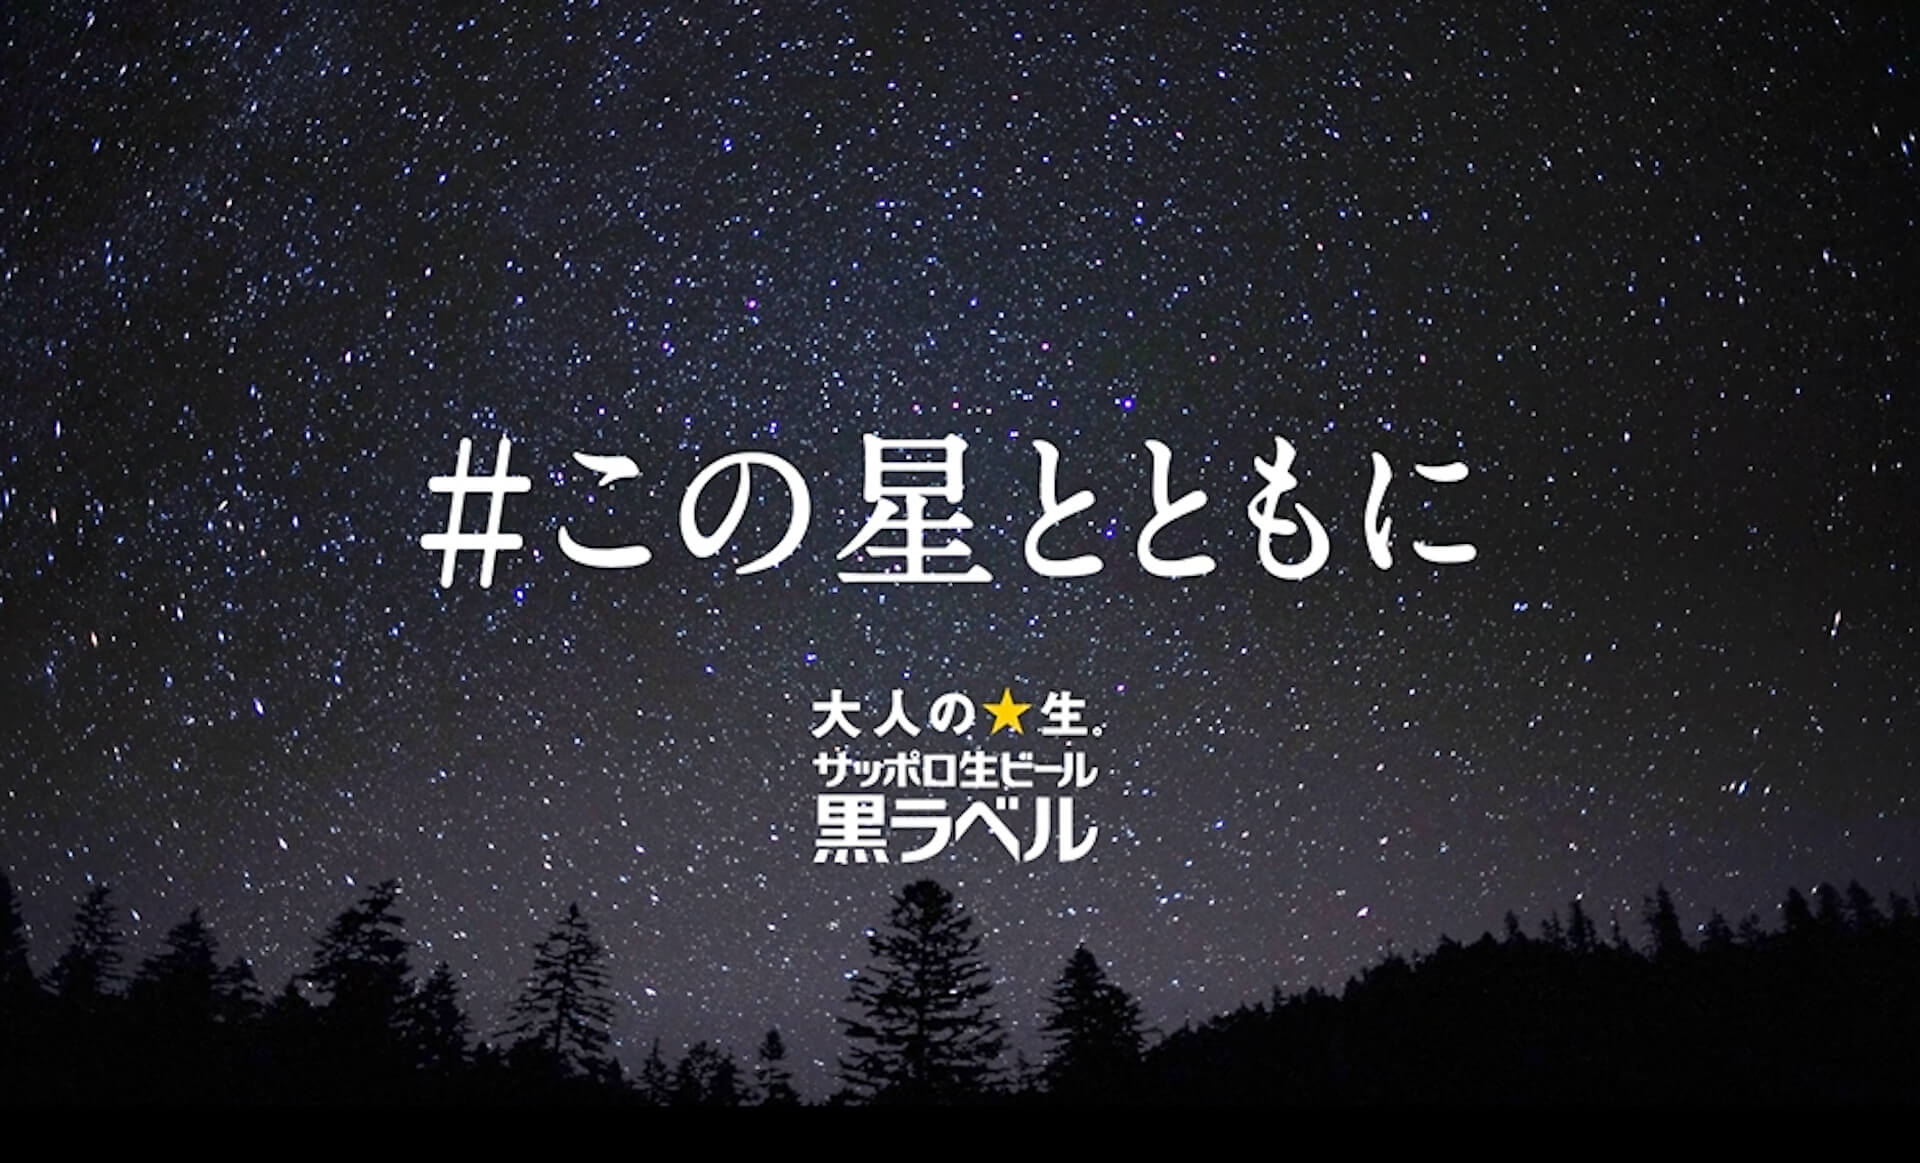 King Gnu常田大希が音楽について語るサッポロビールのCM新バージョンが放映決定!ホームページで特別メッセージムービーも公開 art200707_tsunetadaiki_beer_2